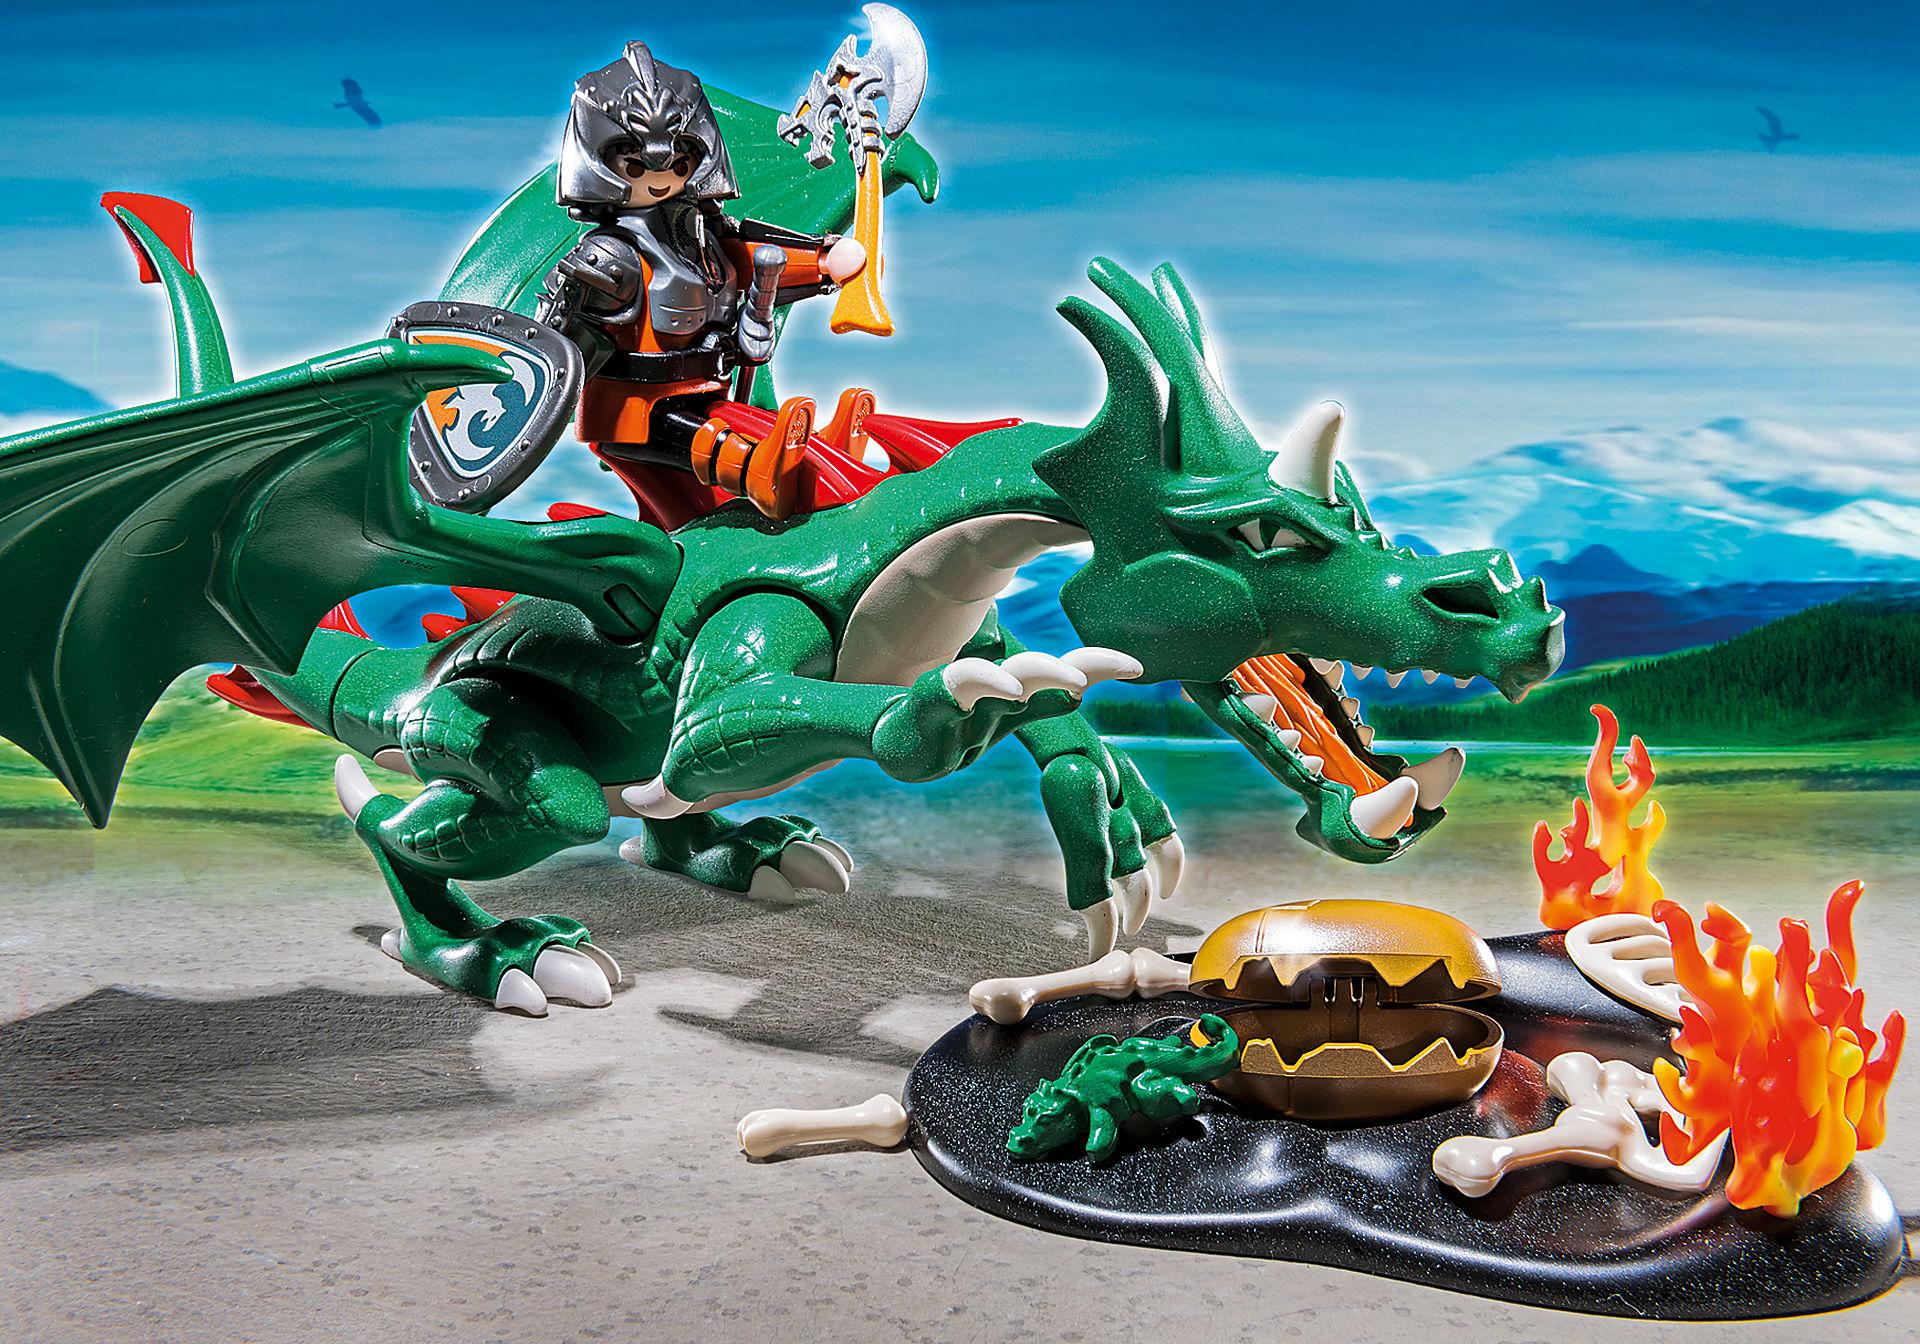 http://media.playmobil.com/i/playmobil/6003_product_extra1/Großer Burgdrache